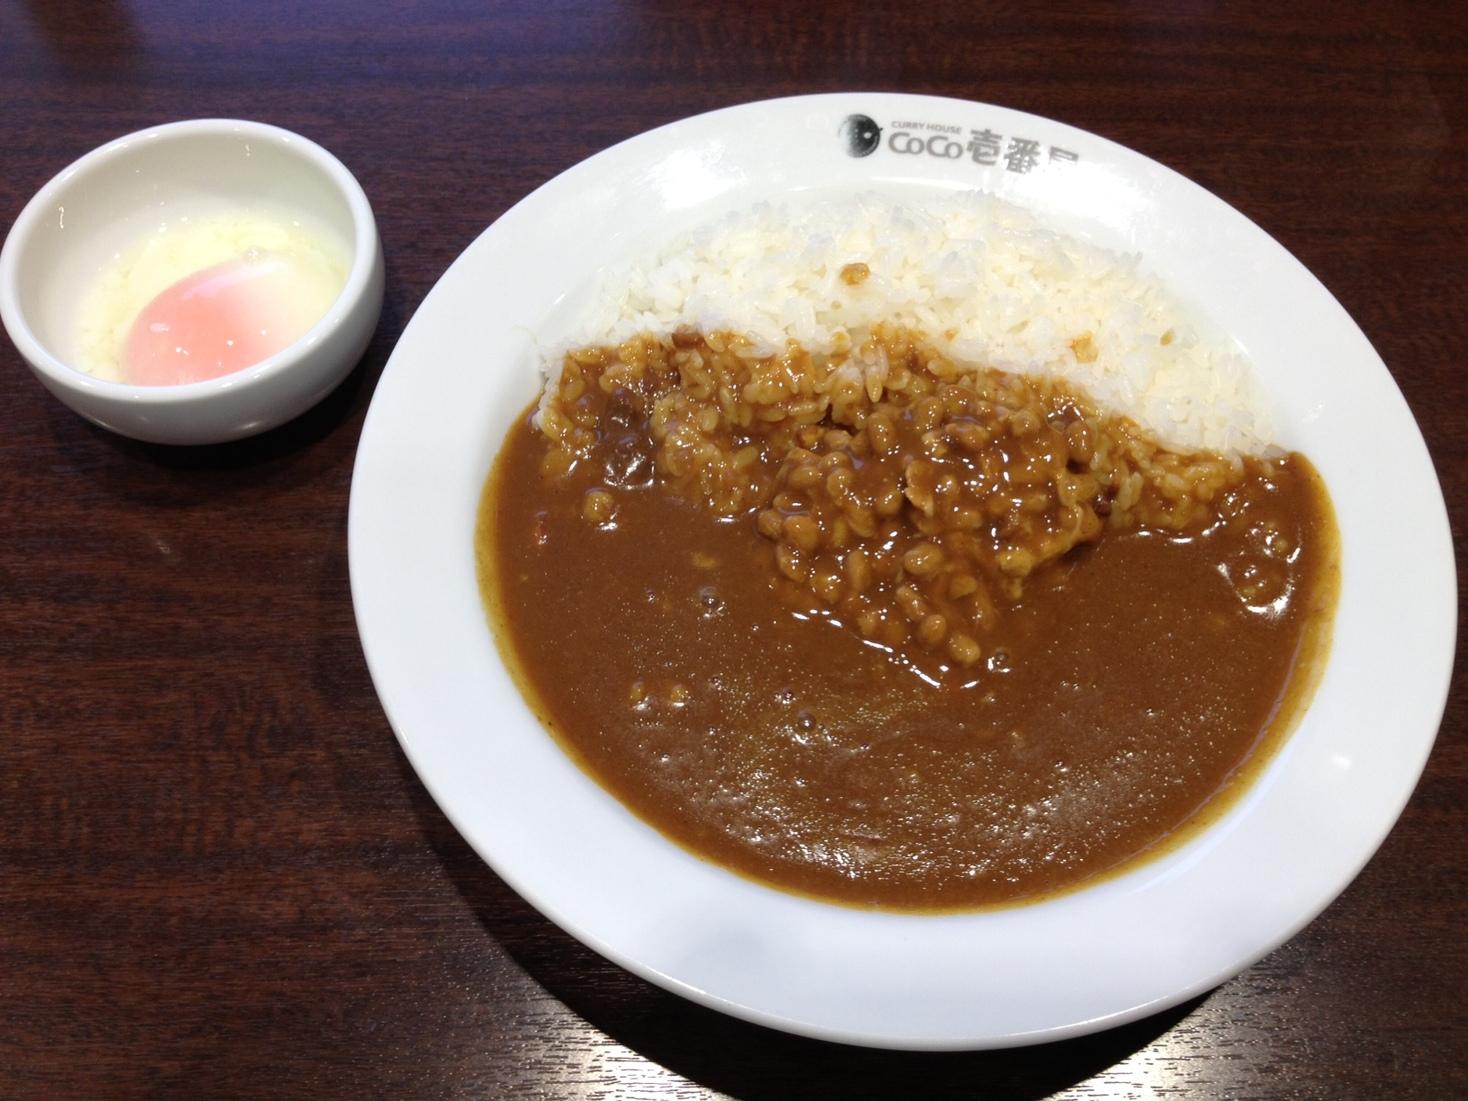 CoCo壱番屋 石川津幡店